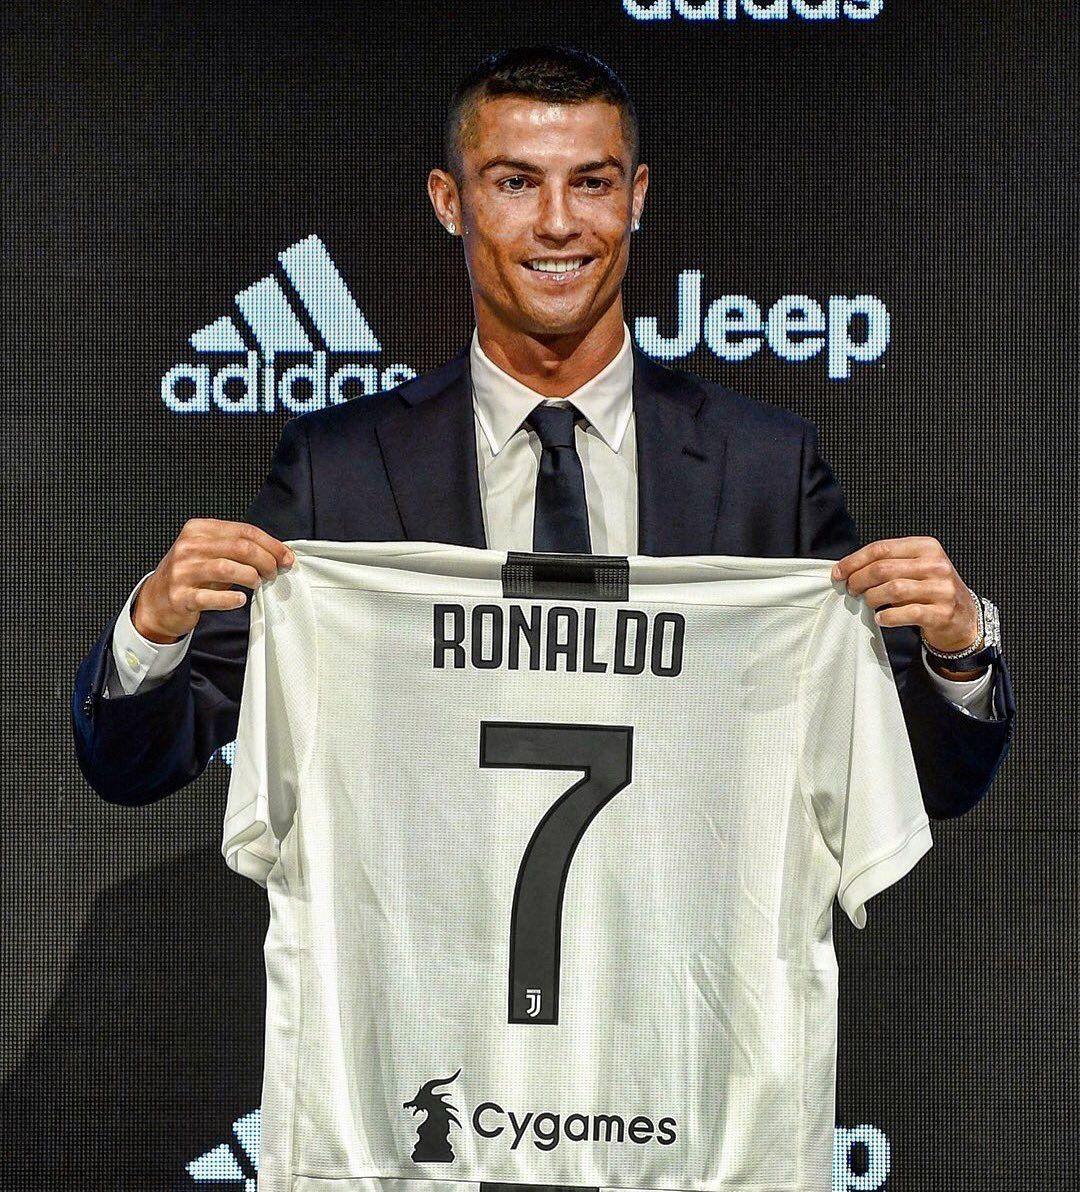 Pin by Aisyah Umairah on Ronaldo Ronaldo, Cristiano